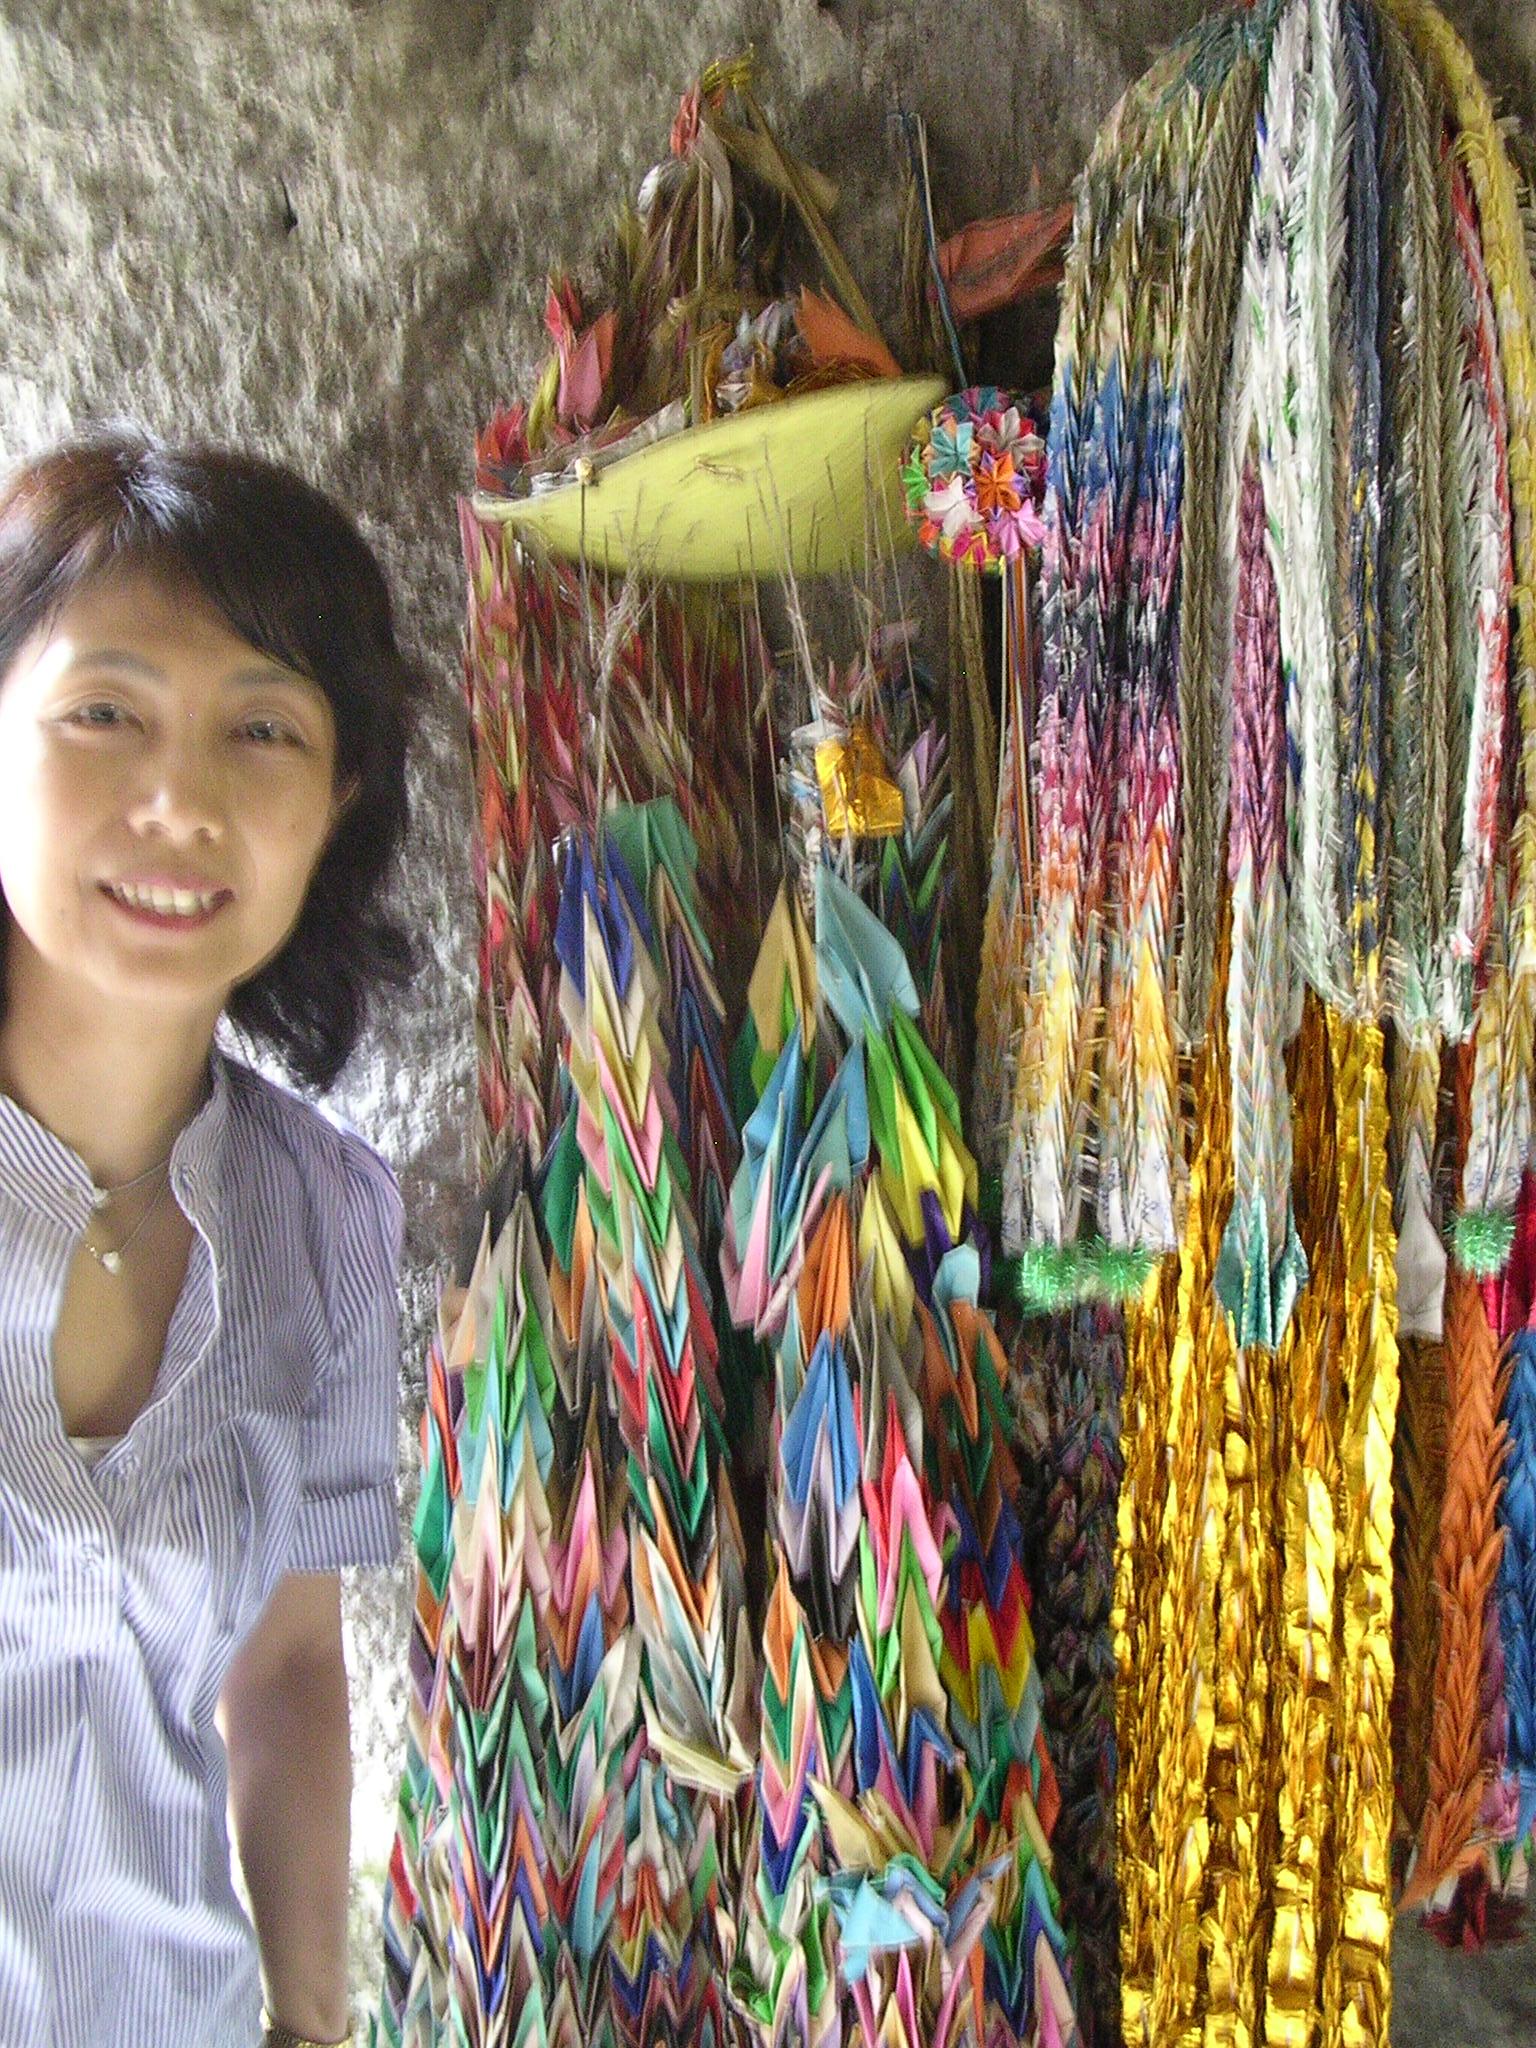 Hiromi With Paper Crane Chains, Kamakura, photo by JBG